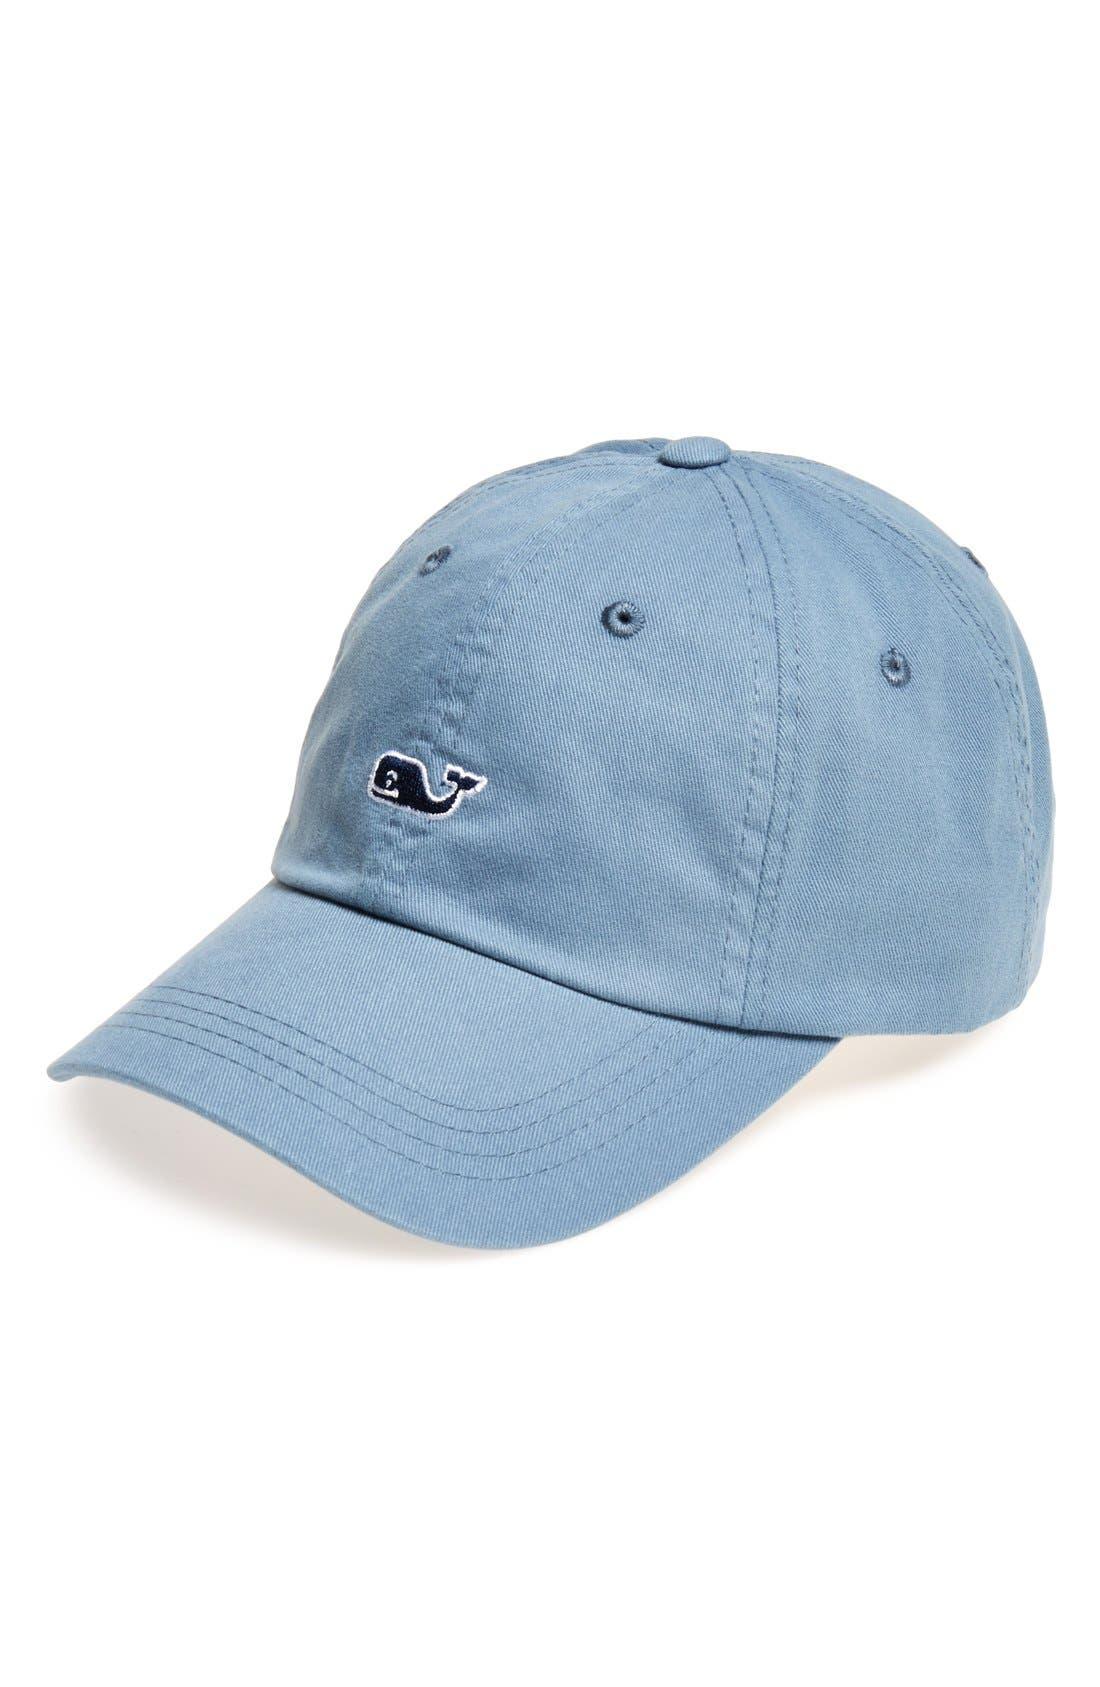 Vineyard Vines Whale Logo Cap